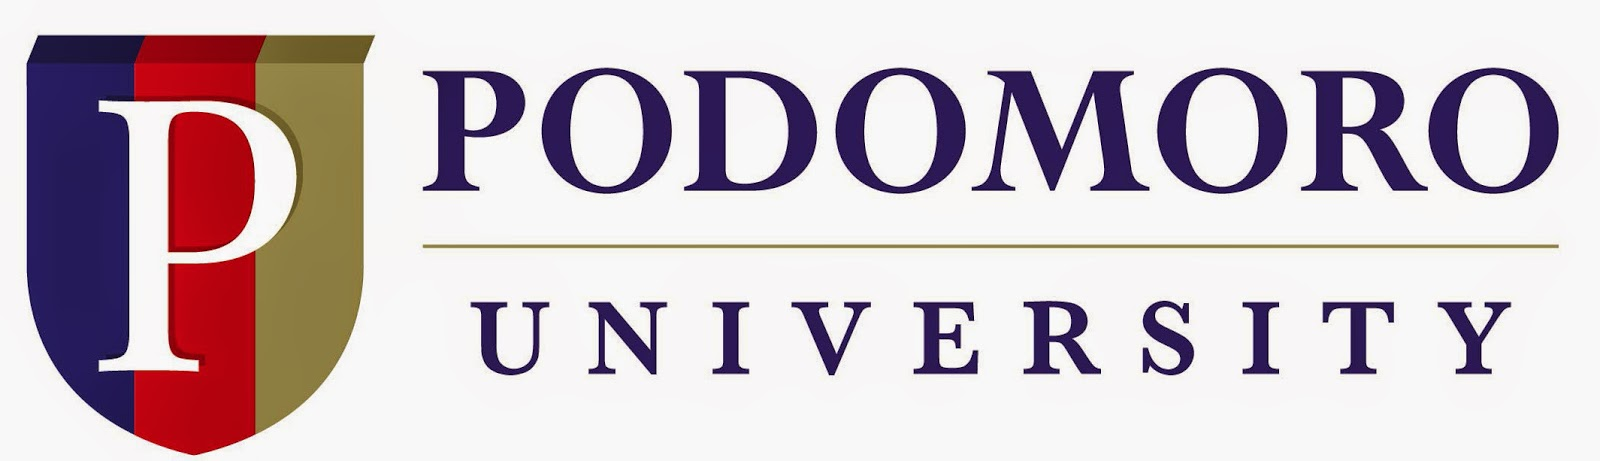 Logo Universitas Podomoro - Ardi La Madi's Blog